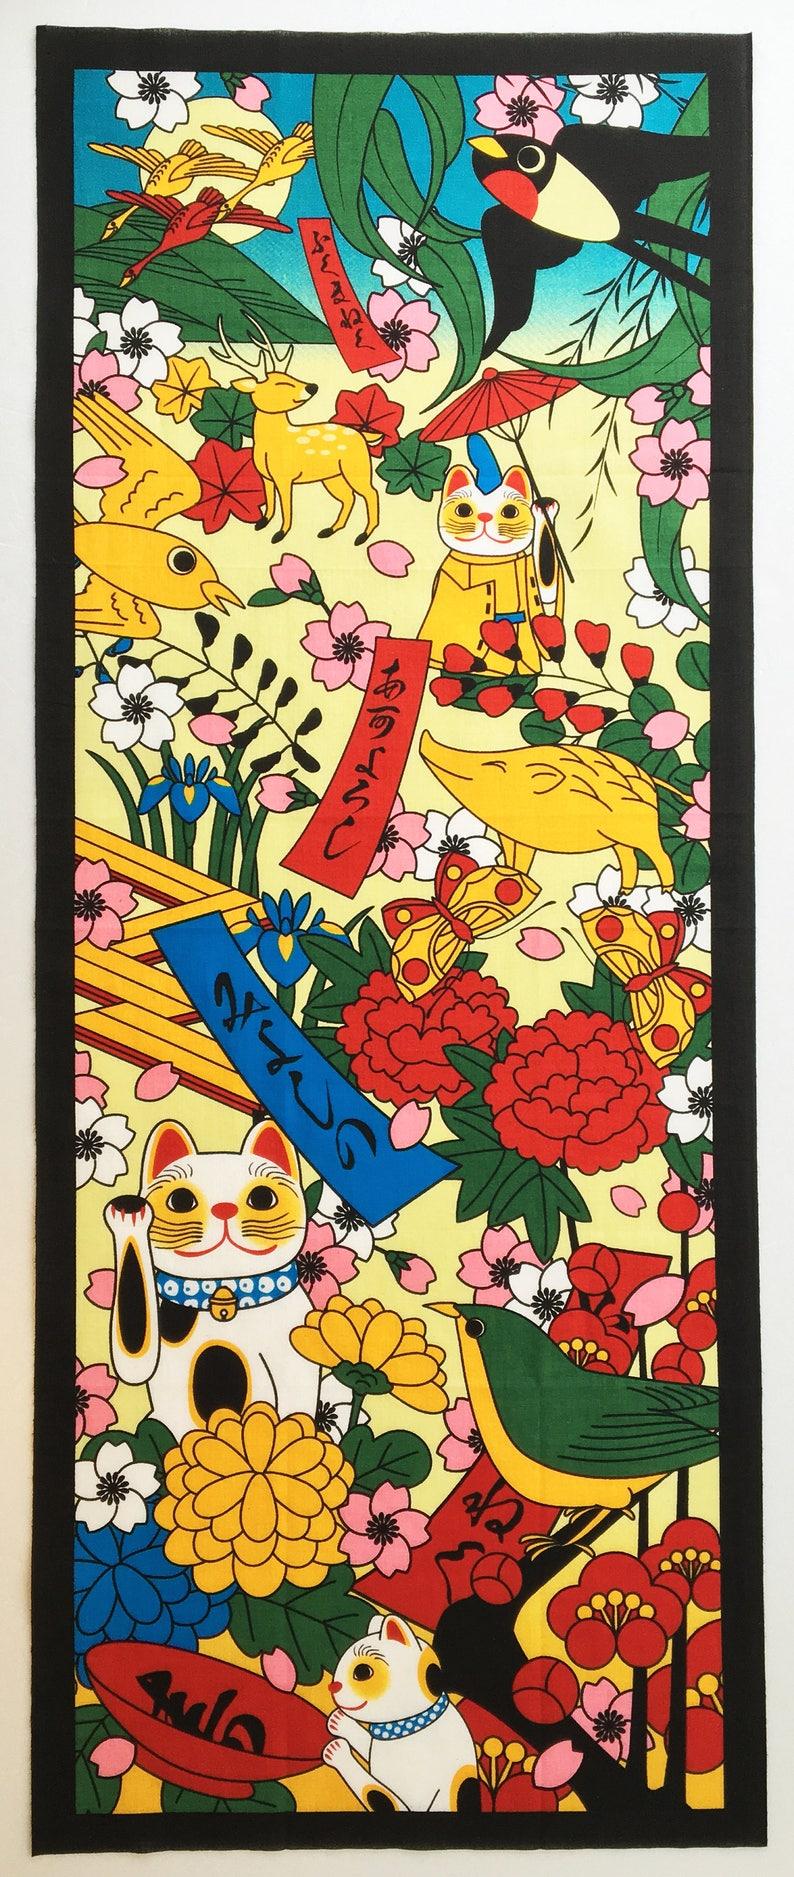 Japanese fabric Tenugui Maneki-neko Fortune Cats cat and flowers noren curtain kawaii fabric japanese tenugui cat home decor, cat fabric